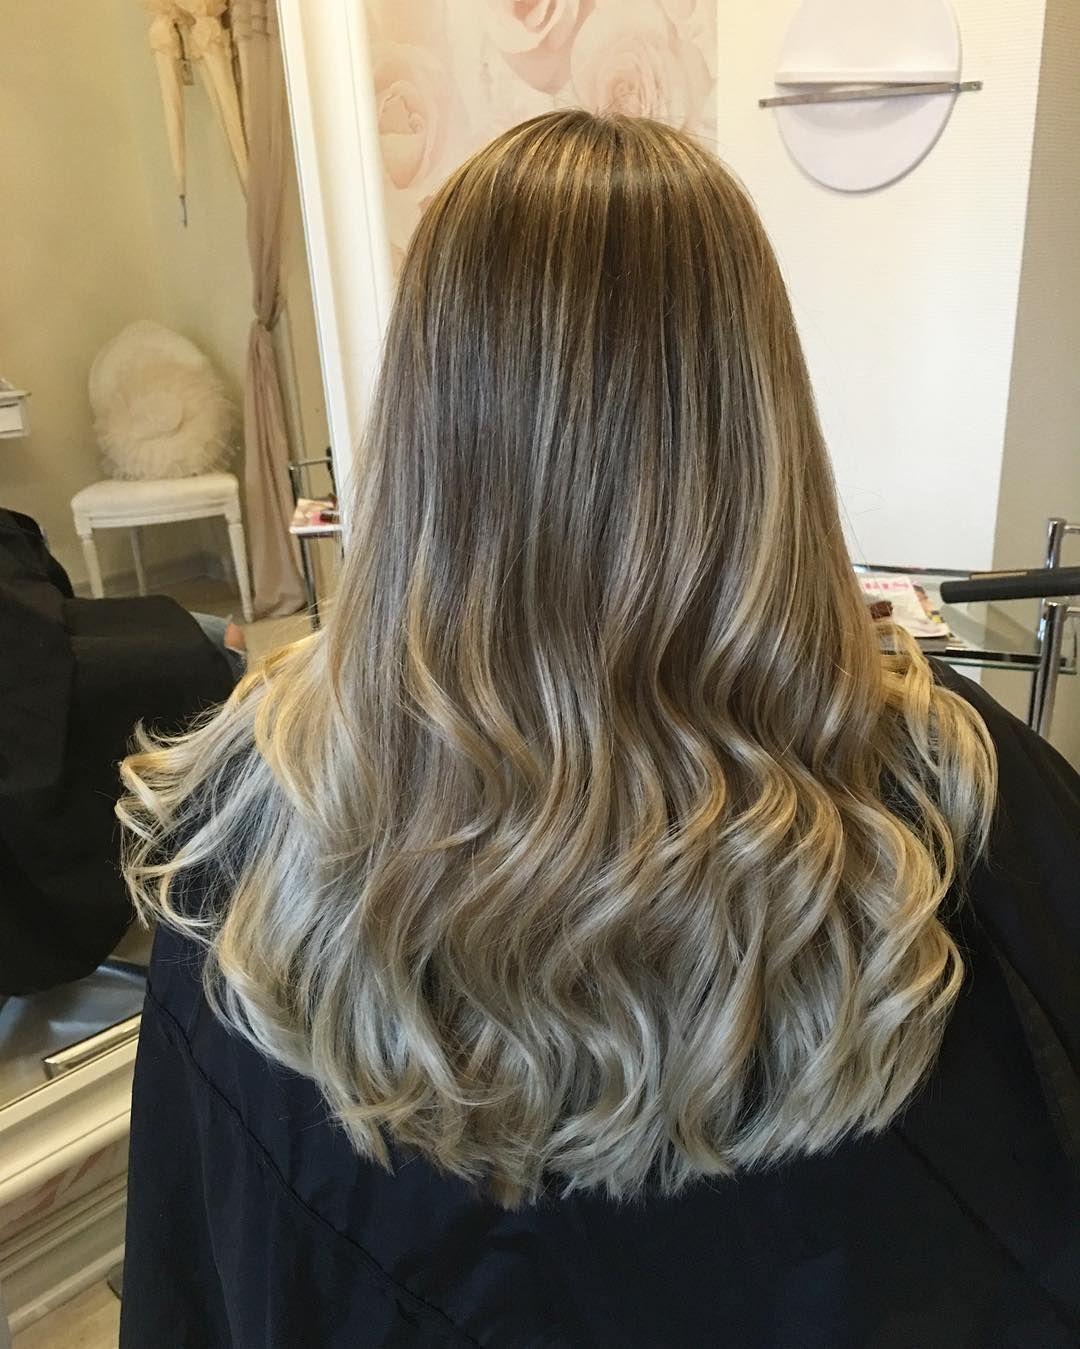 50 Stunning Light And Dark Ash Blonde Hair Color Ideas Trending